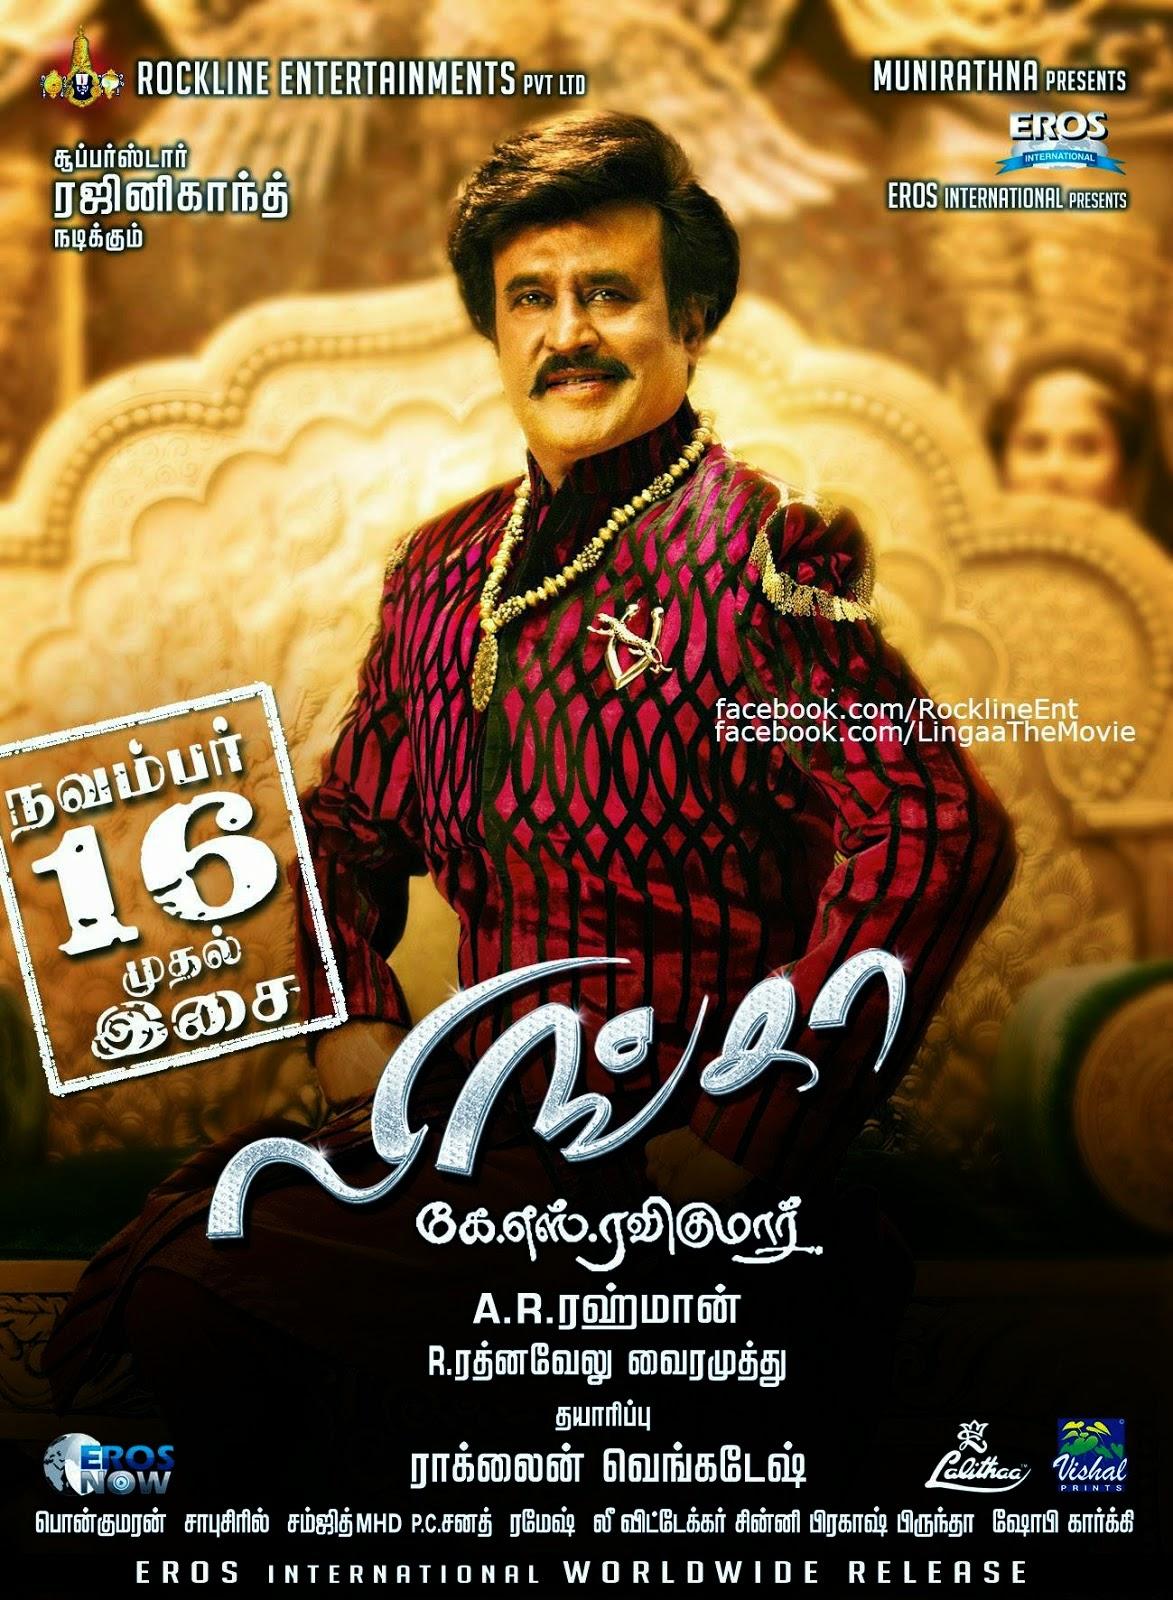 Lingaa full movie urdu 3gp Mobile